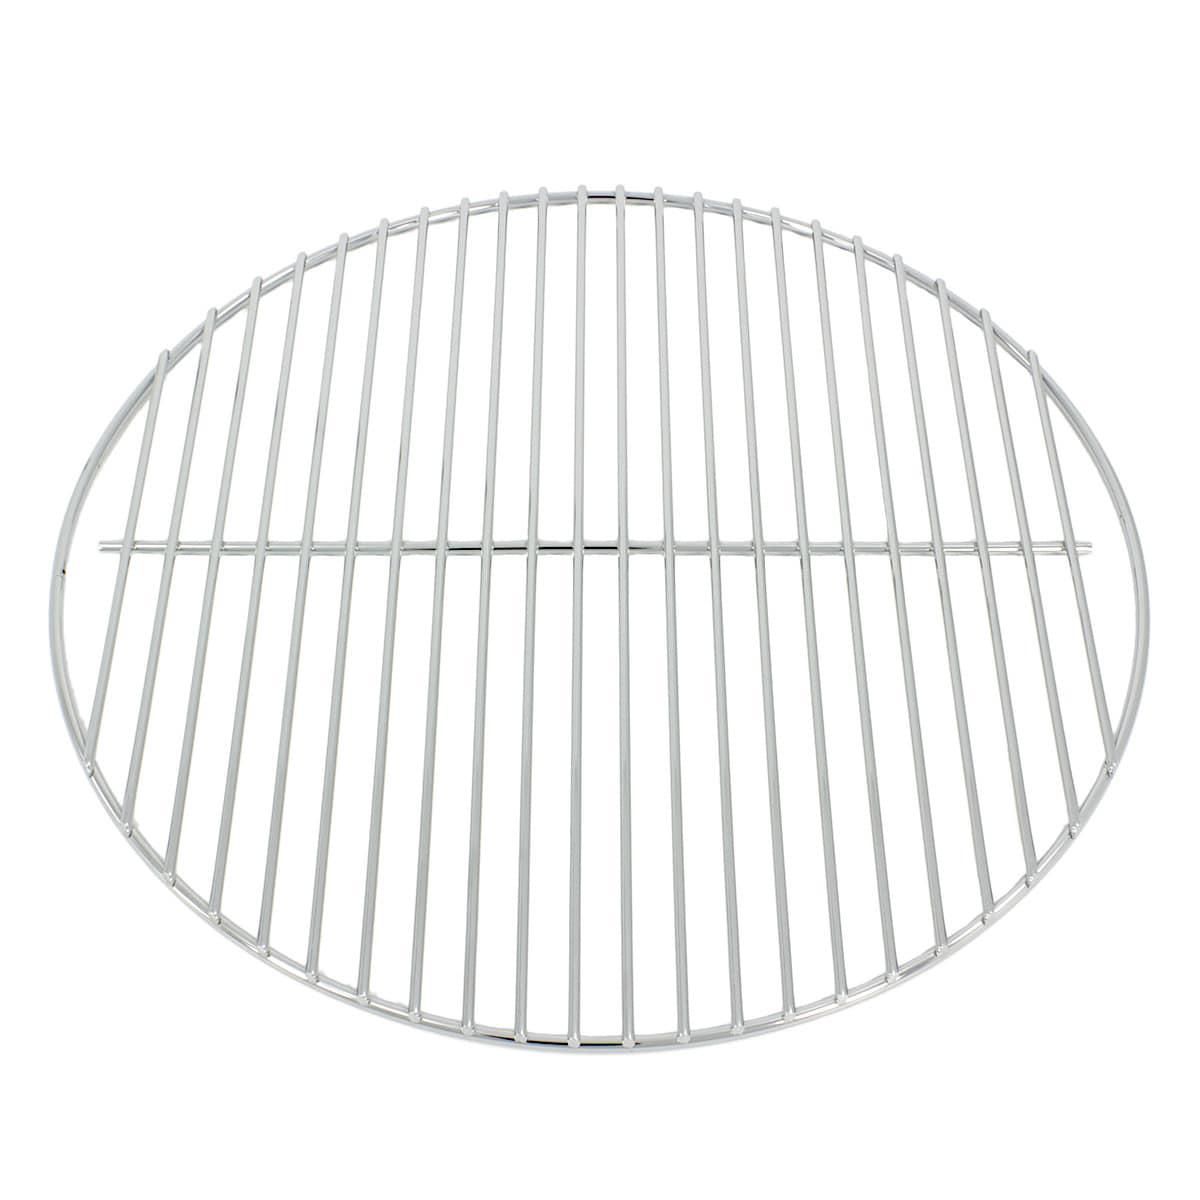 Weber grillrist 8407 37 cm